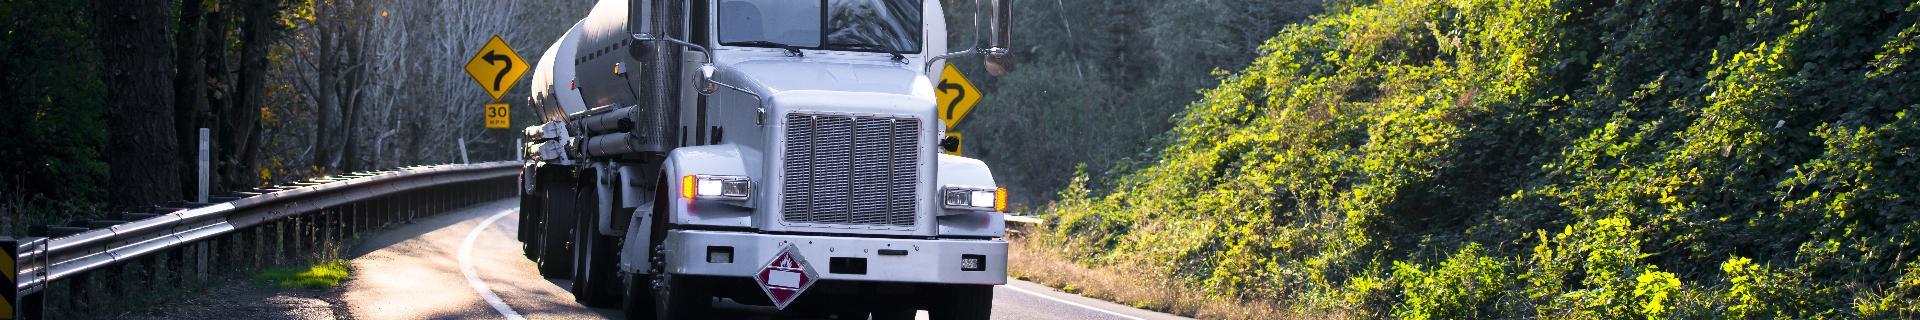 TDG – Transportation of Dangerous Goods: Canada/US